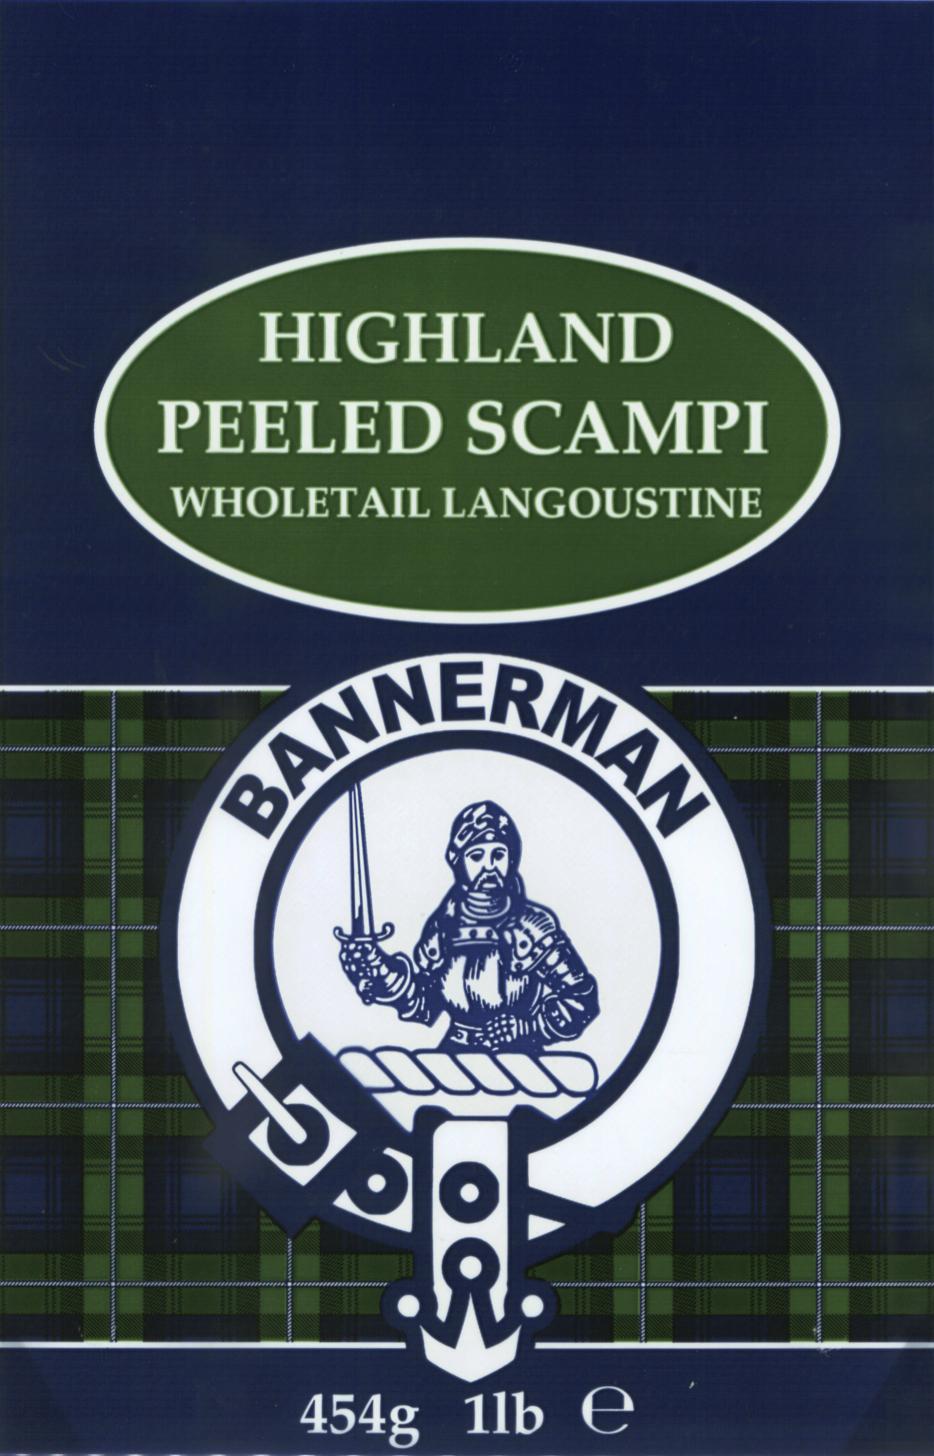 Highland Peeled Scampi.png